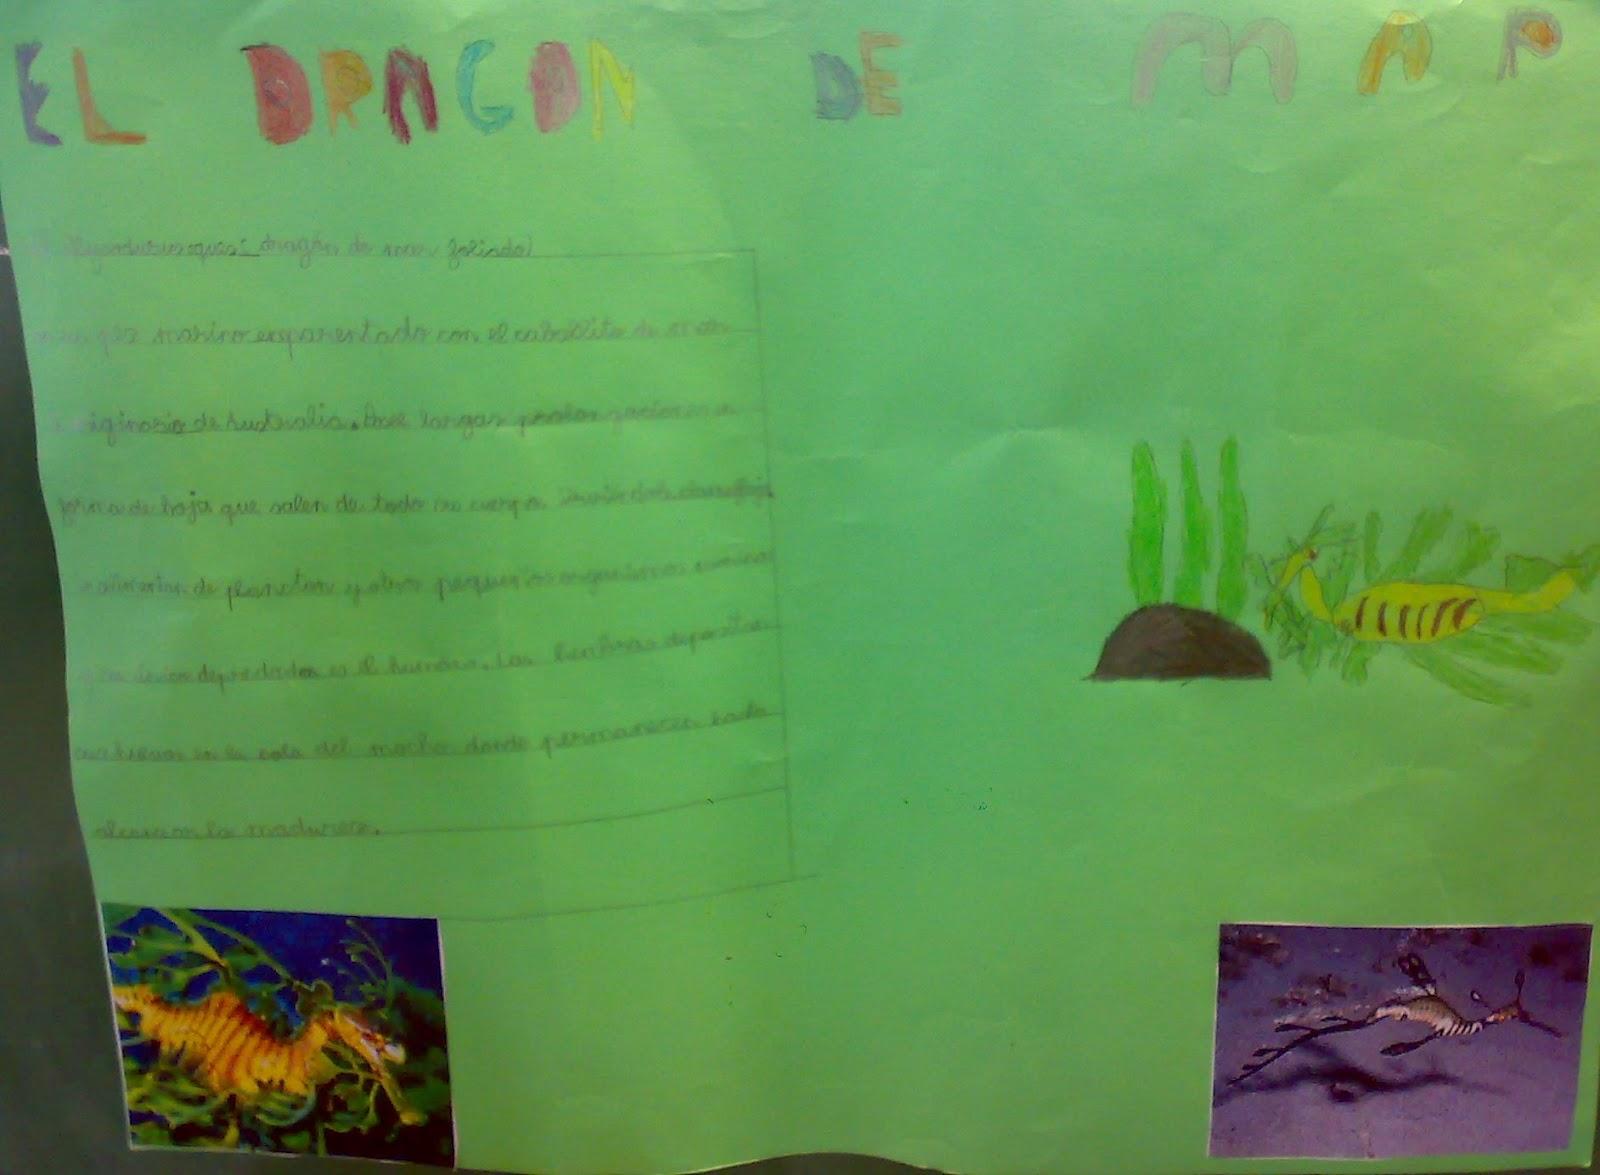 Ceip El Zargal Second Grade El Dragon De Mar Dani